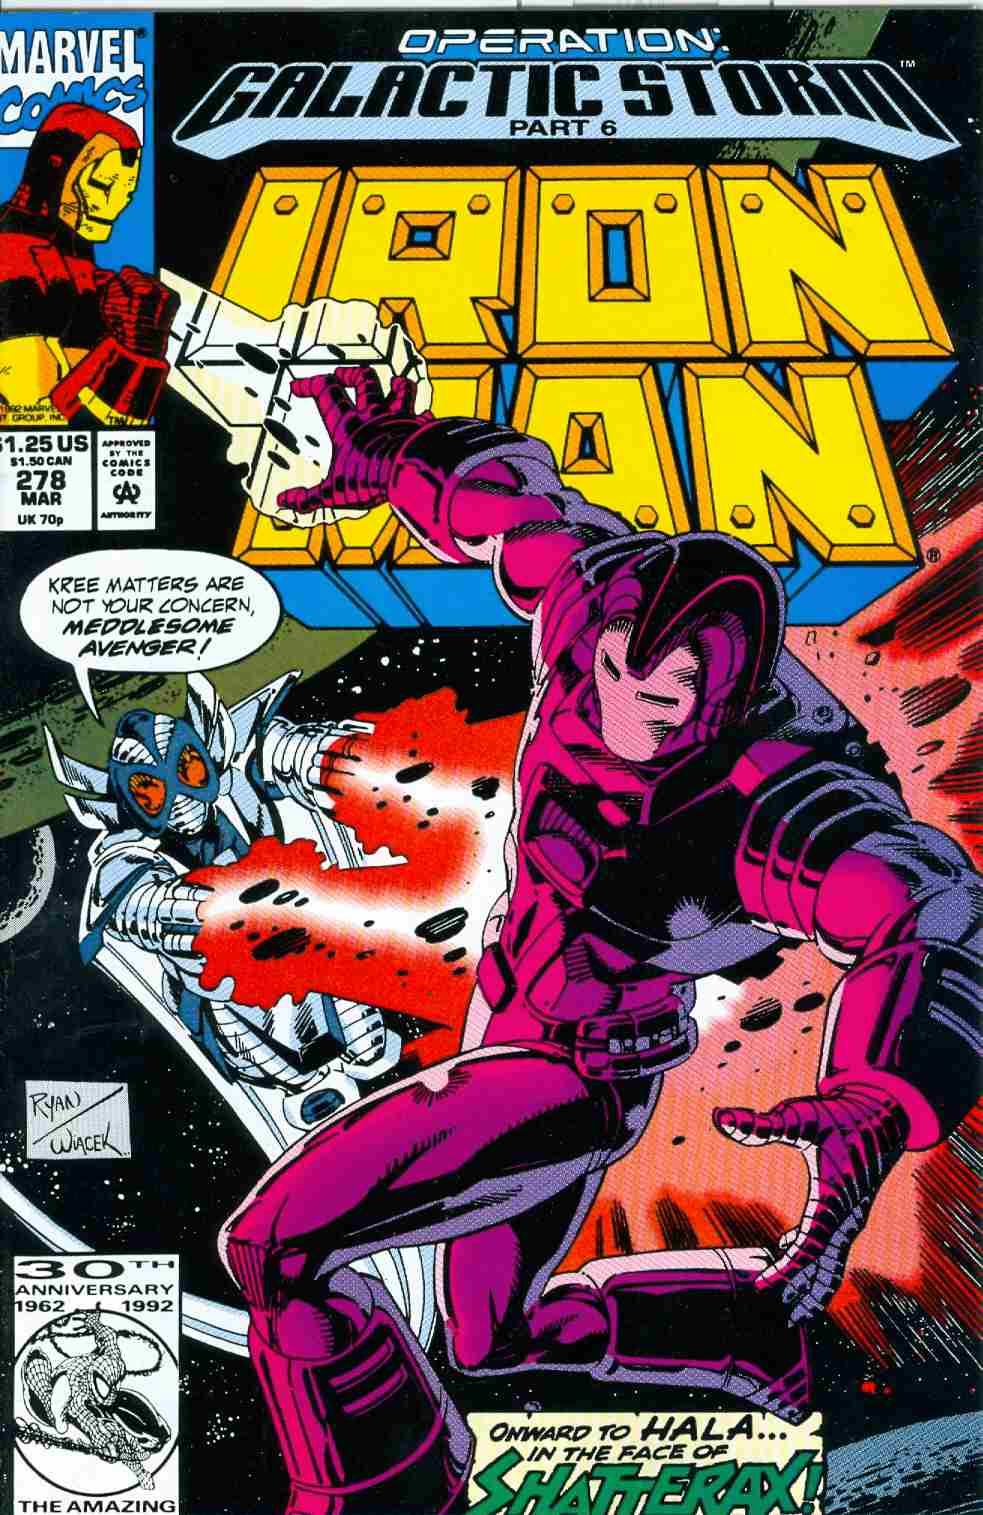 Iron man Telepresence Armor